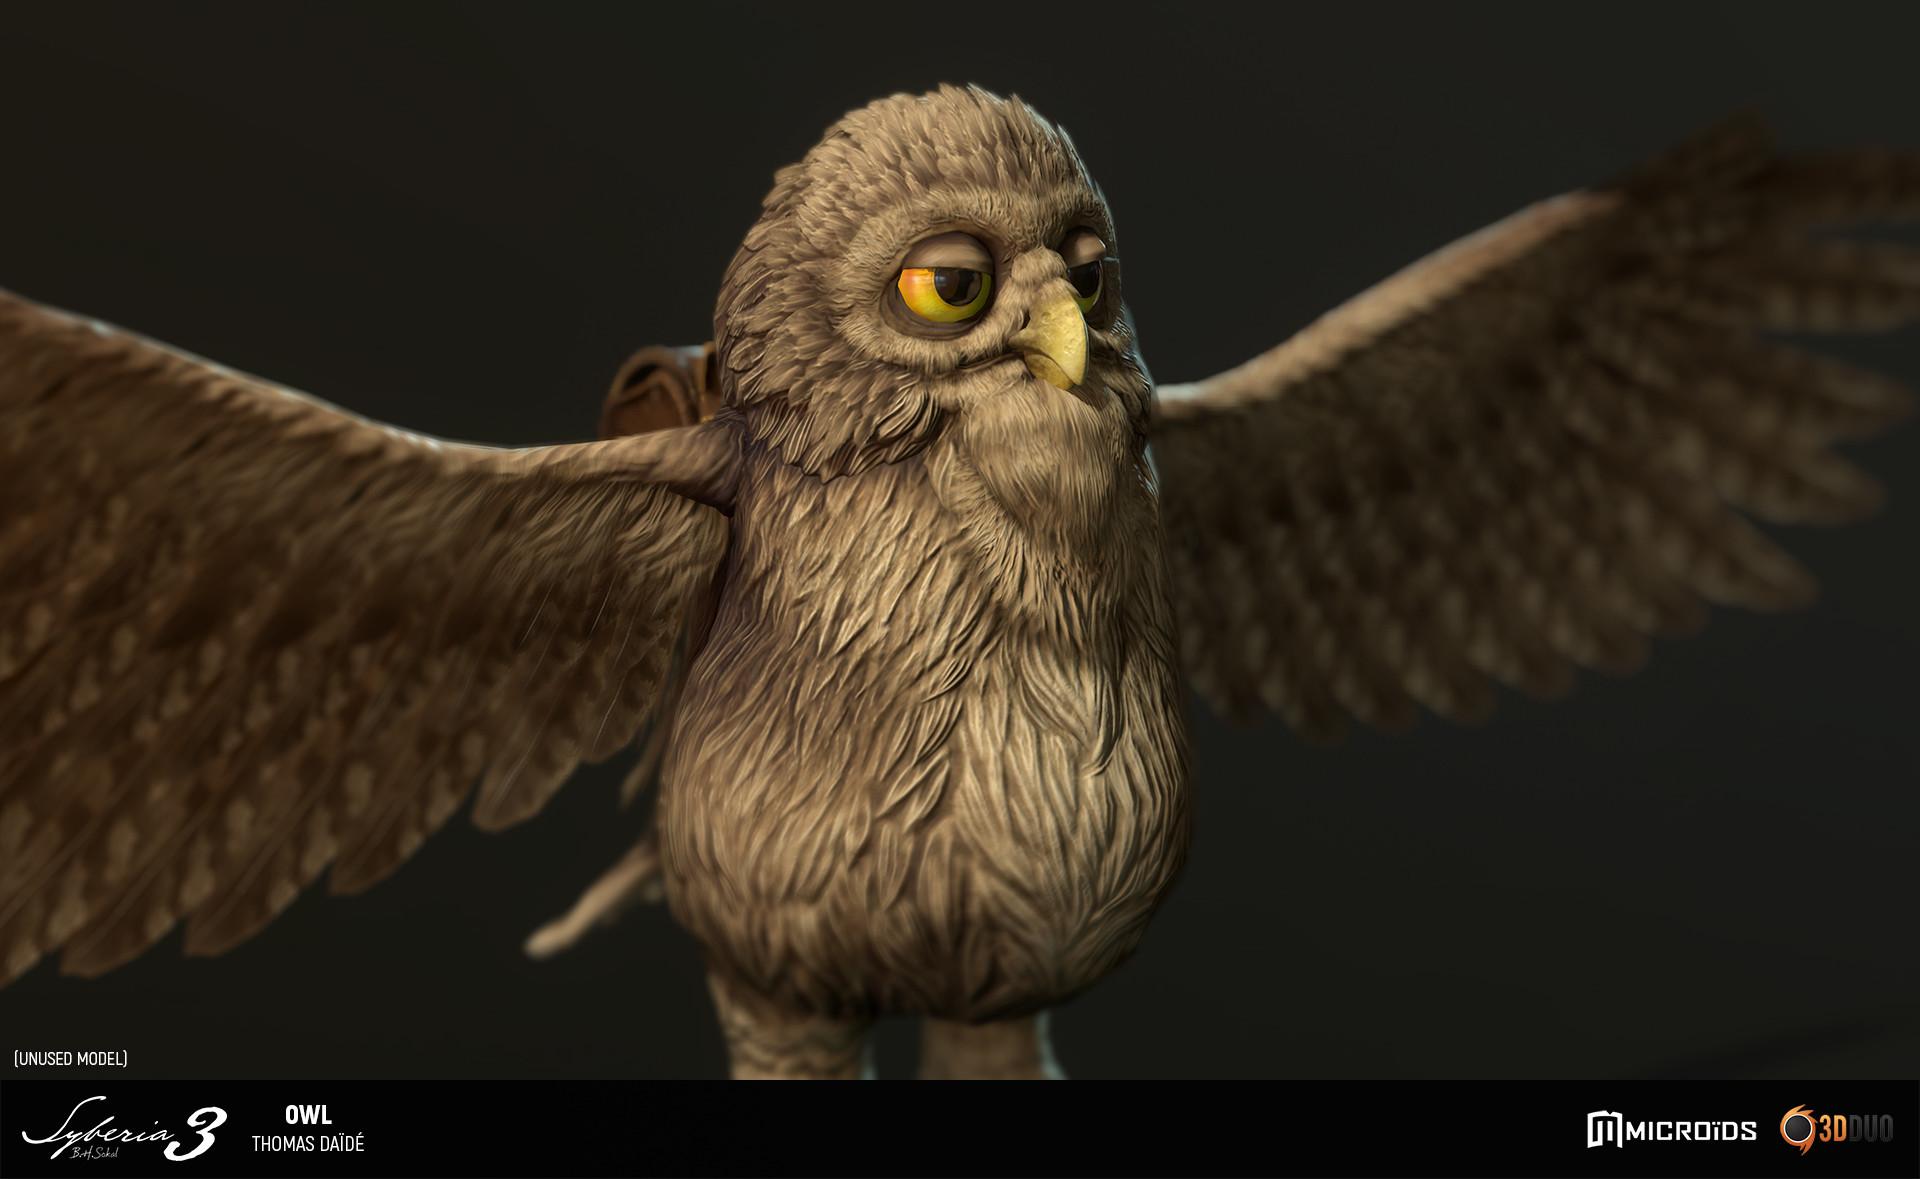 Thomas daide tdaide syb owl 02